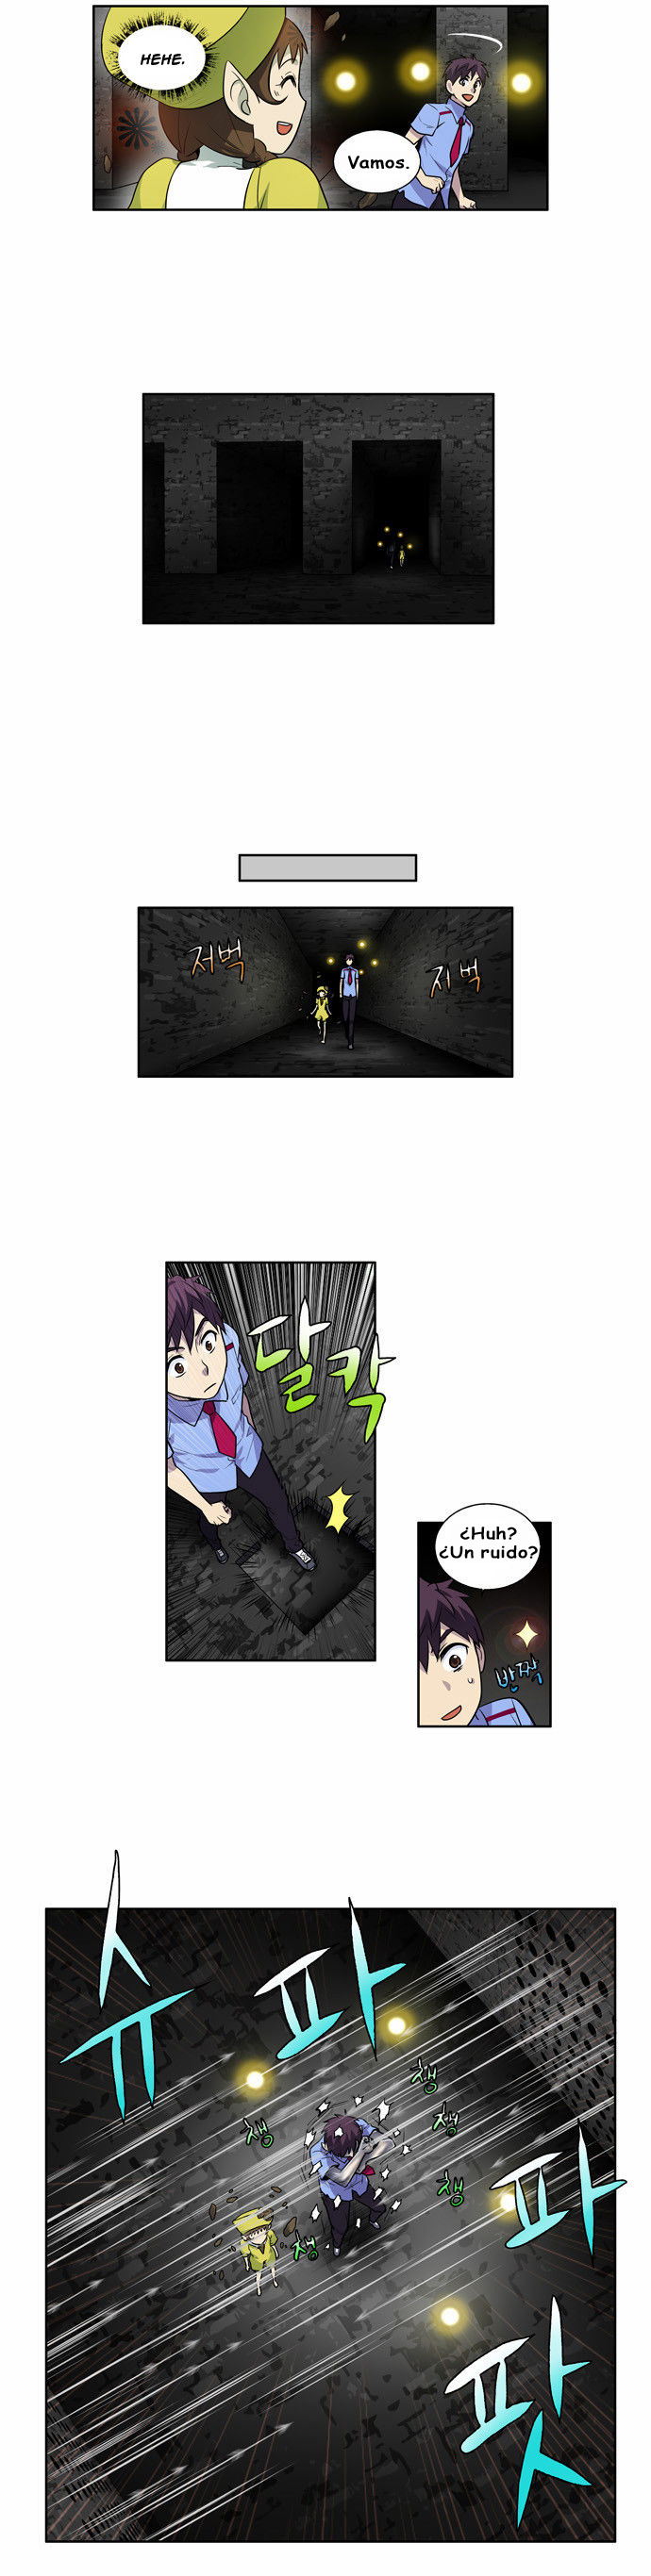 https://c5.ninemanga.com/es_manga/61/1725/396909/9744d4f003ffdce5eaa7fa9586087114.jpg Page 5